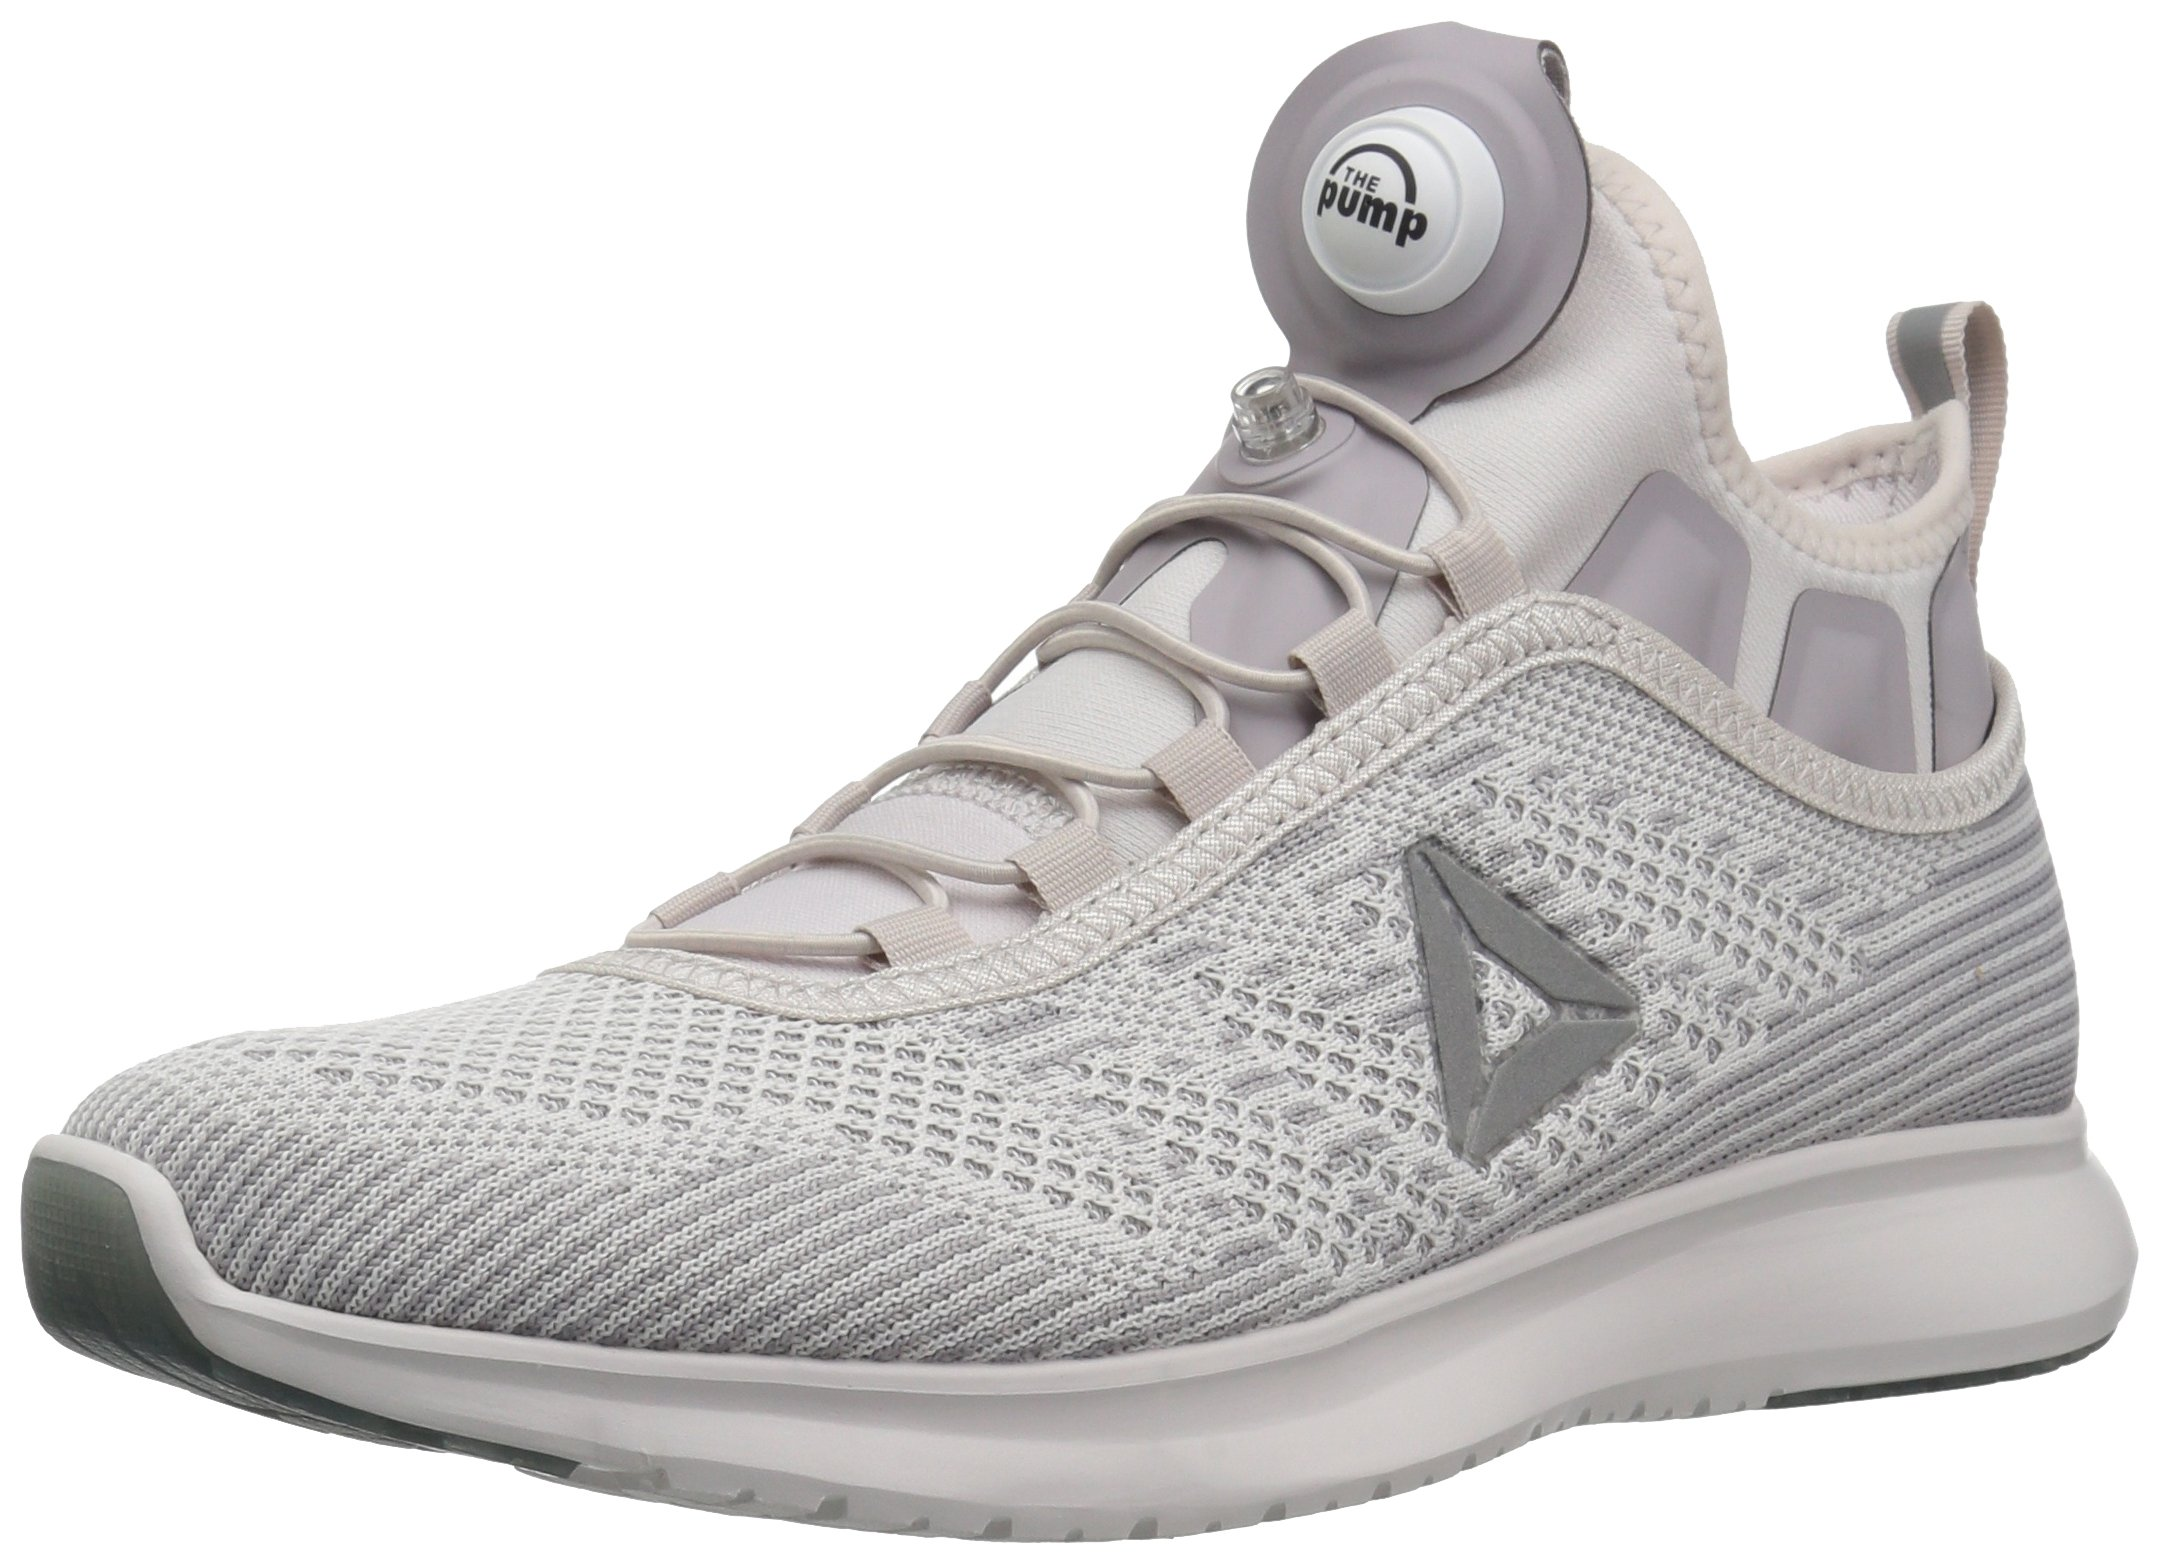 Reebok Women's Pump Plus Ultk Track Shoe, Lilac Ash/Whisper Grey/Asteroid Dust, 8.5 M US